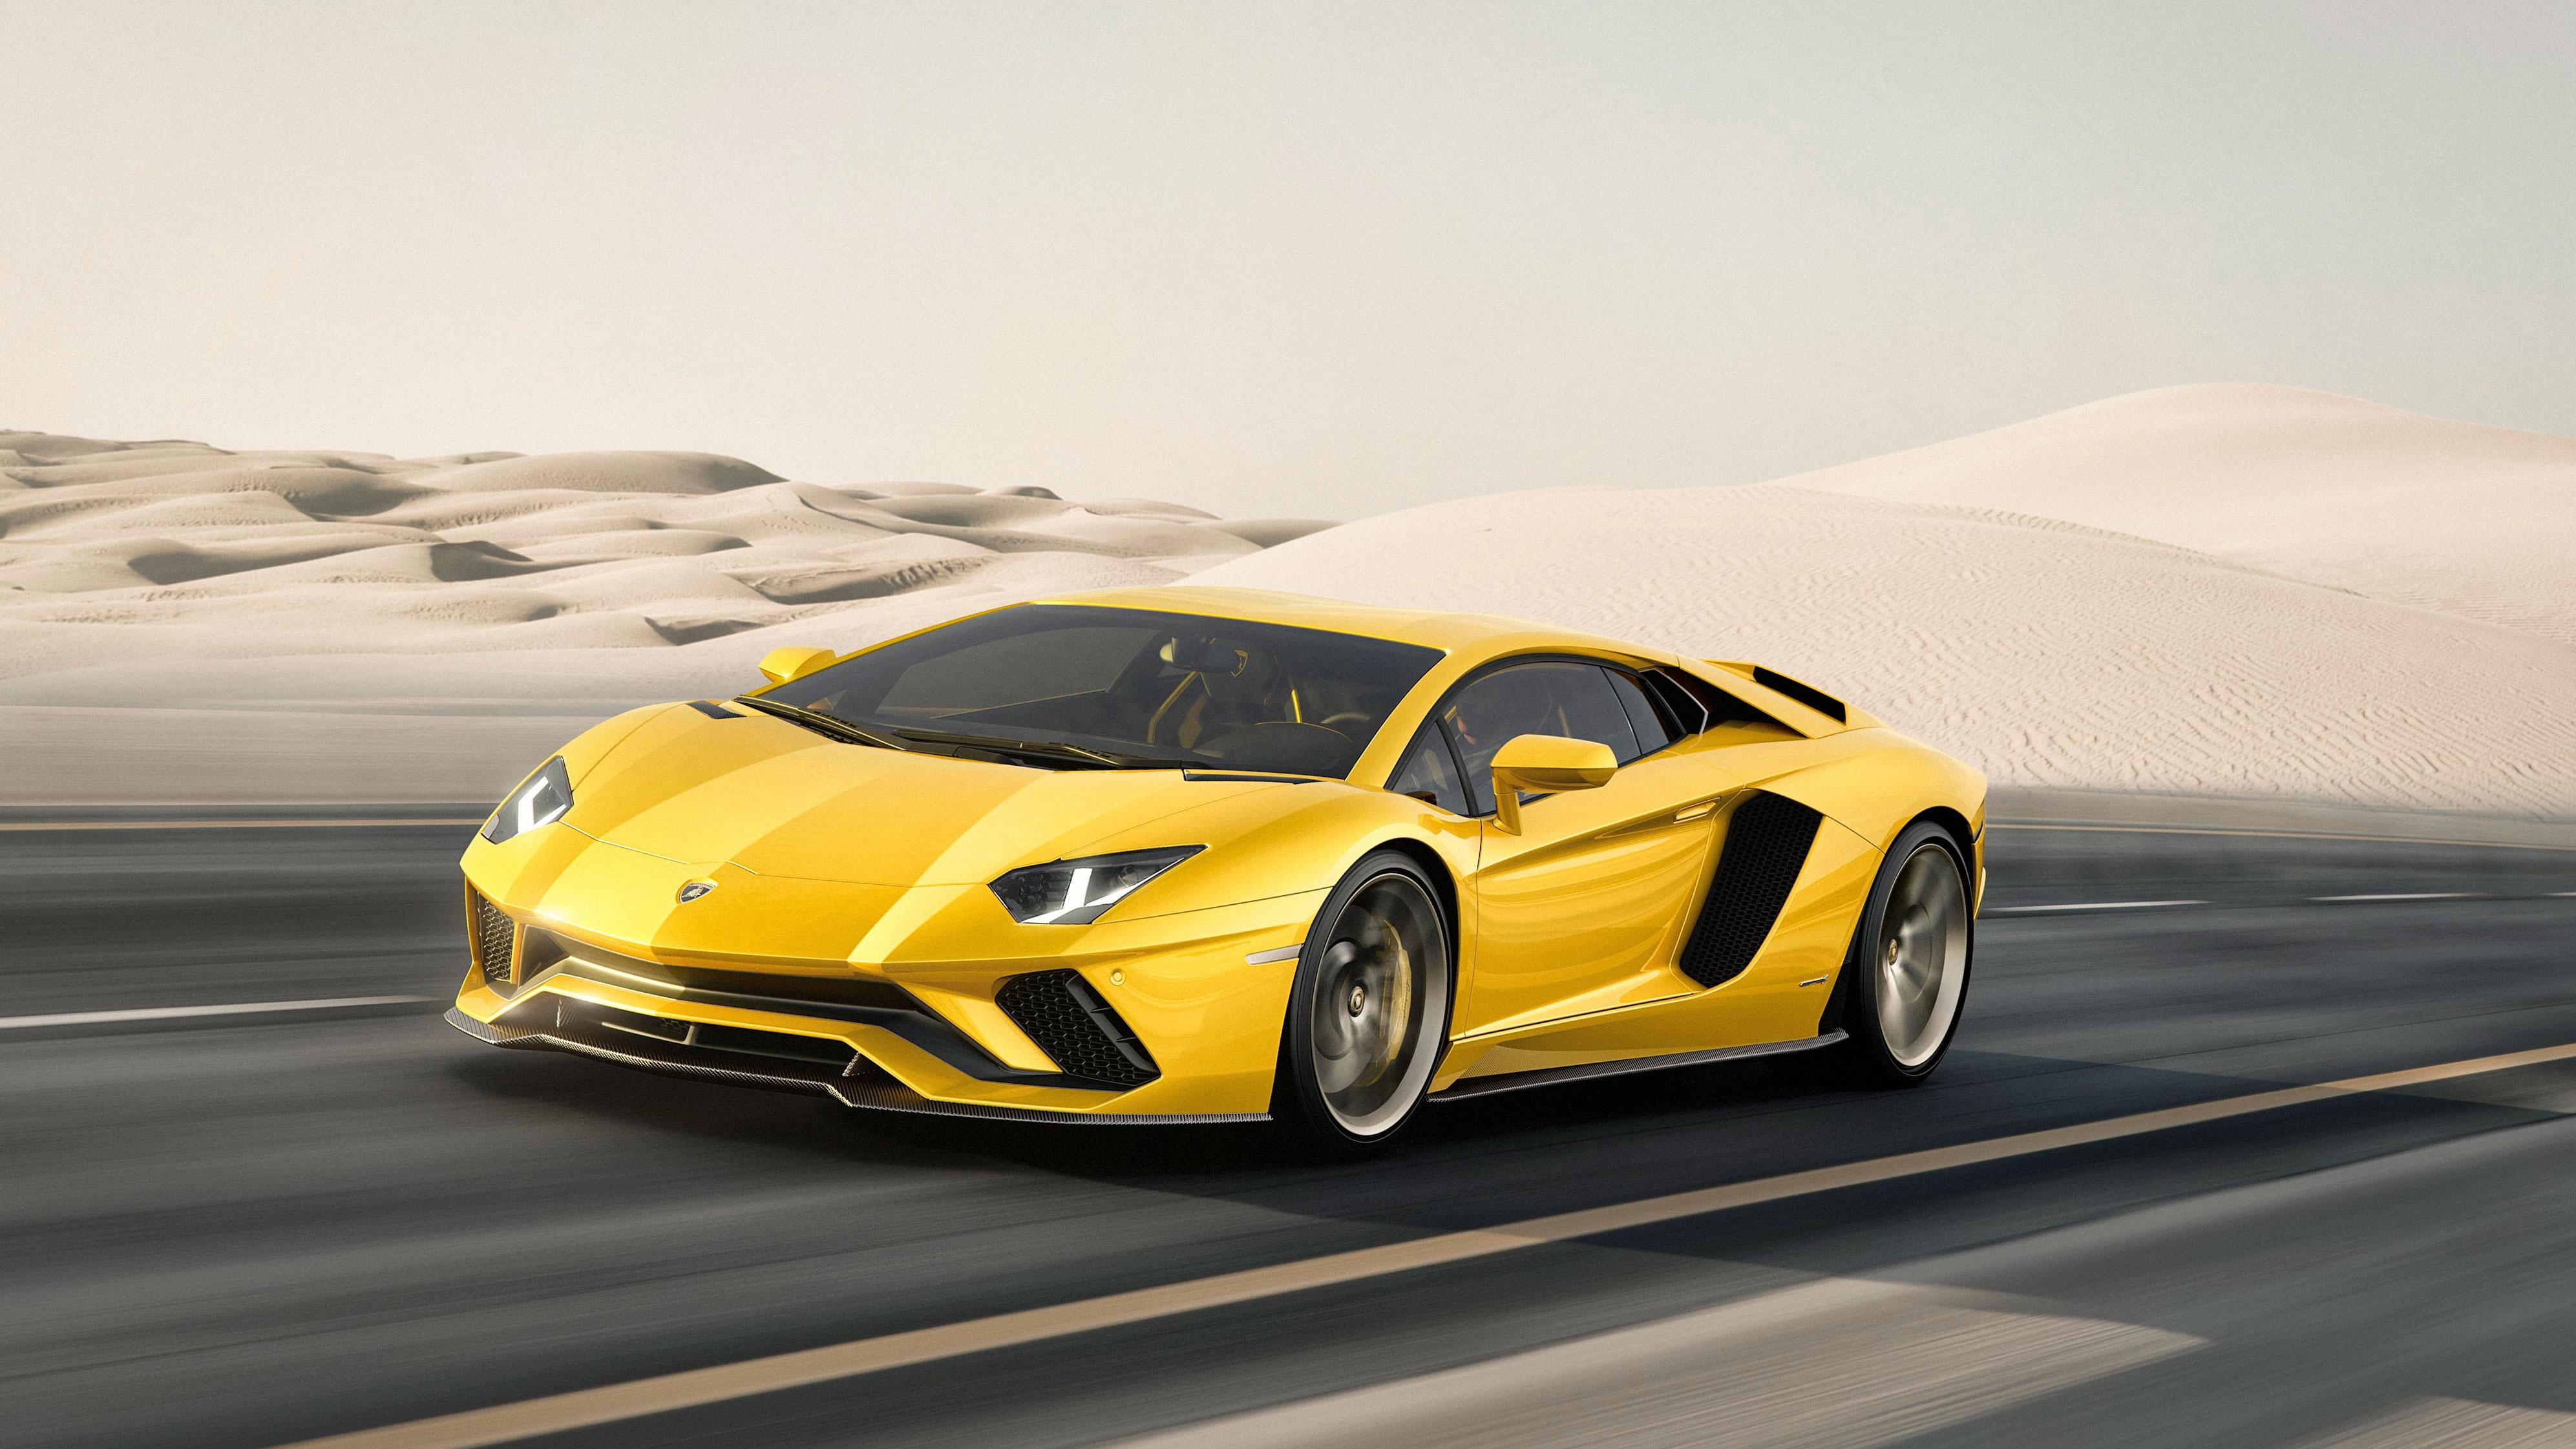 New Used Lamborghini Aventador Cars For Sale Autotrader